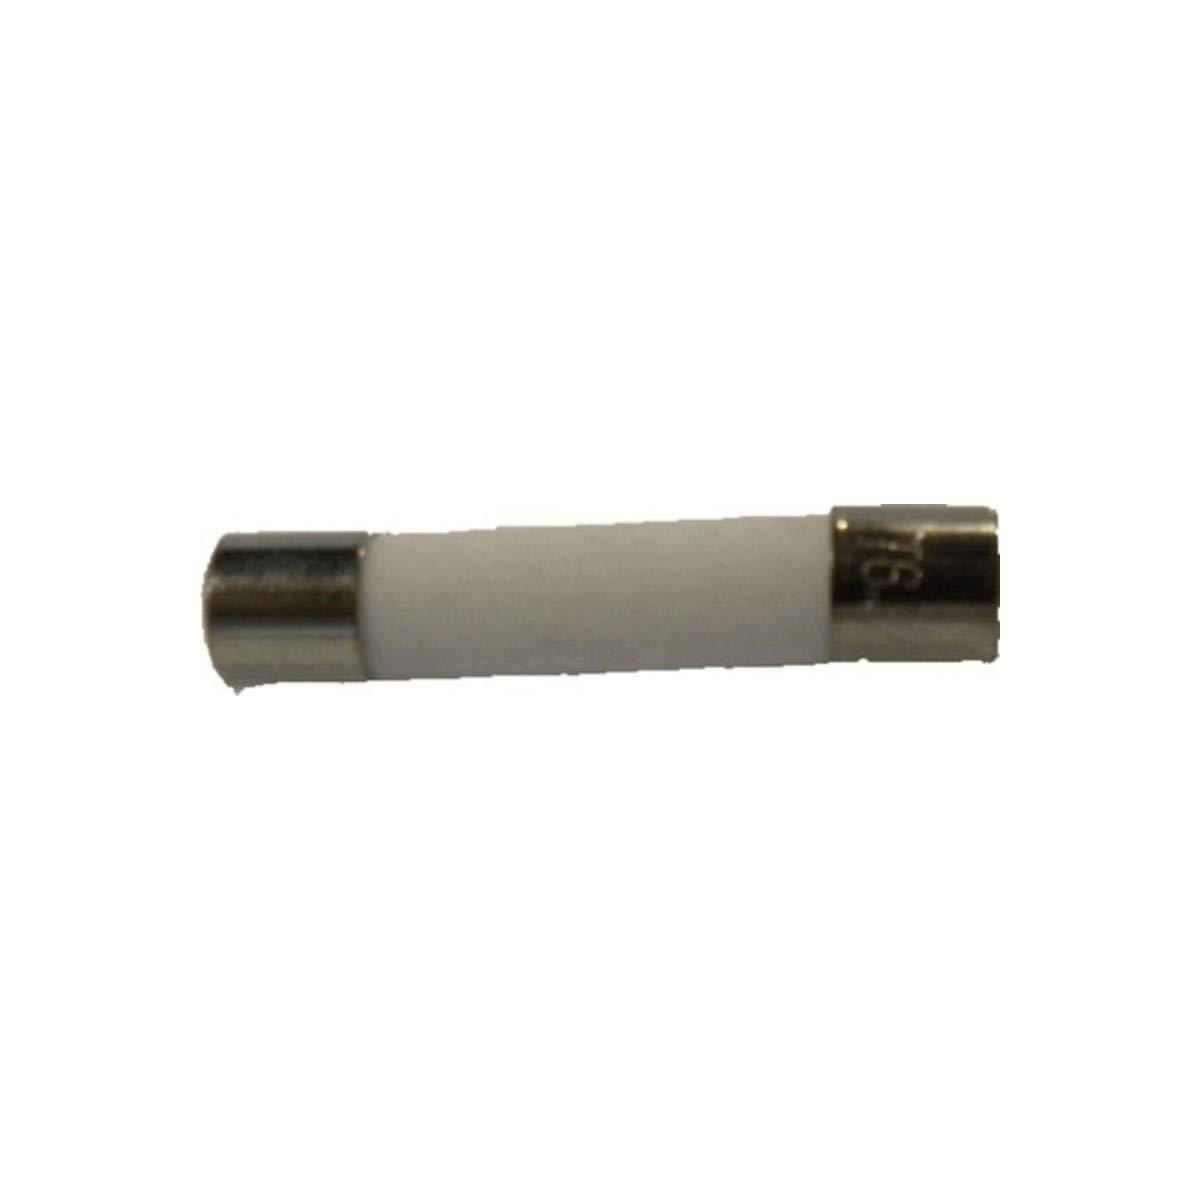 Recamania Fusible microondas Standard diametro 6, 3 x 32 mm ...